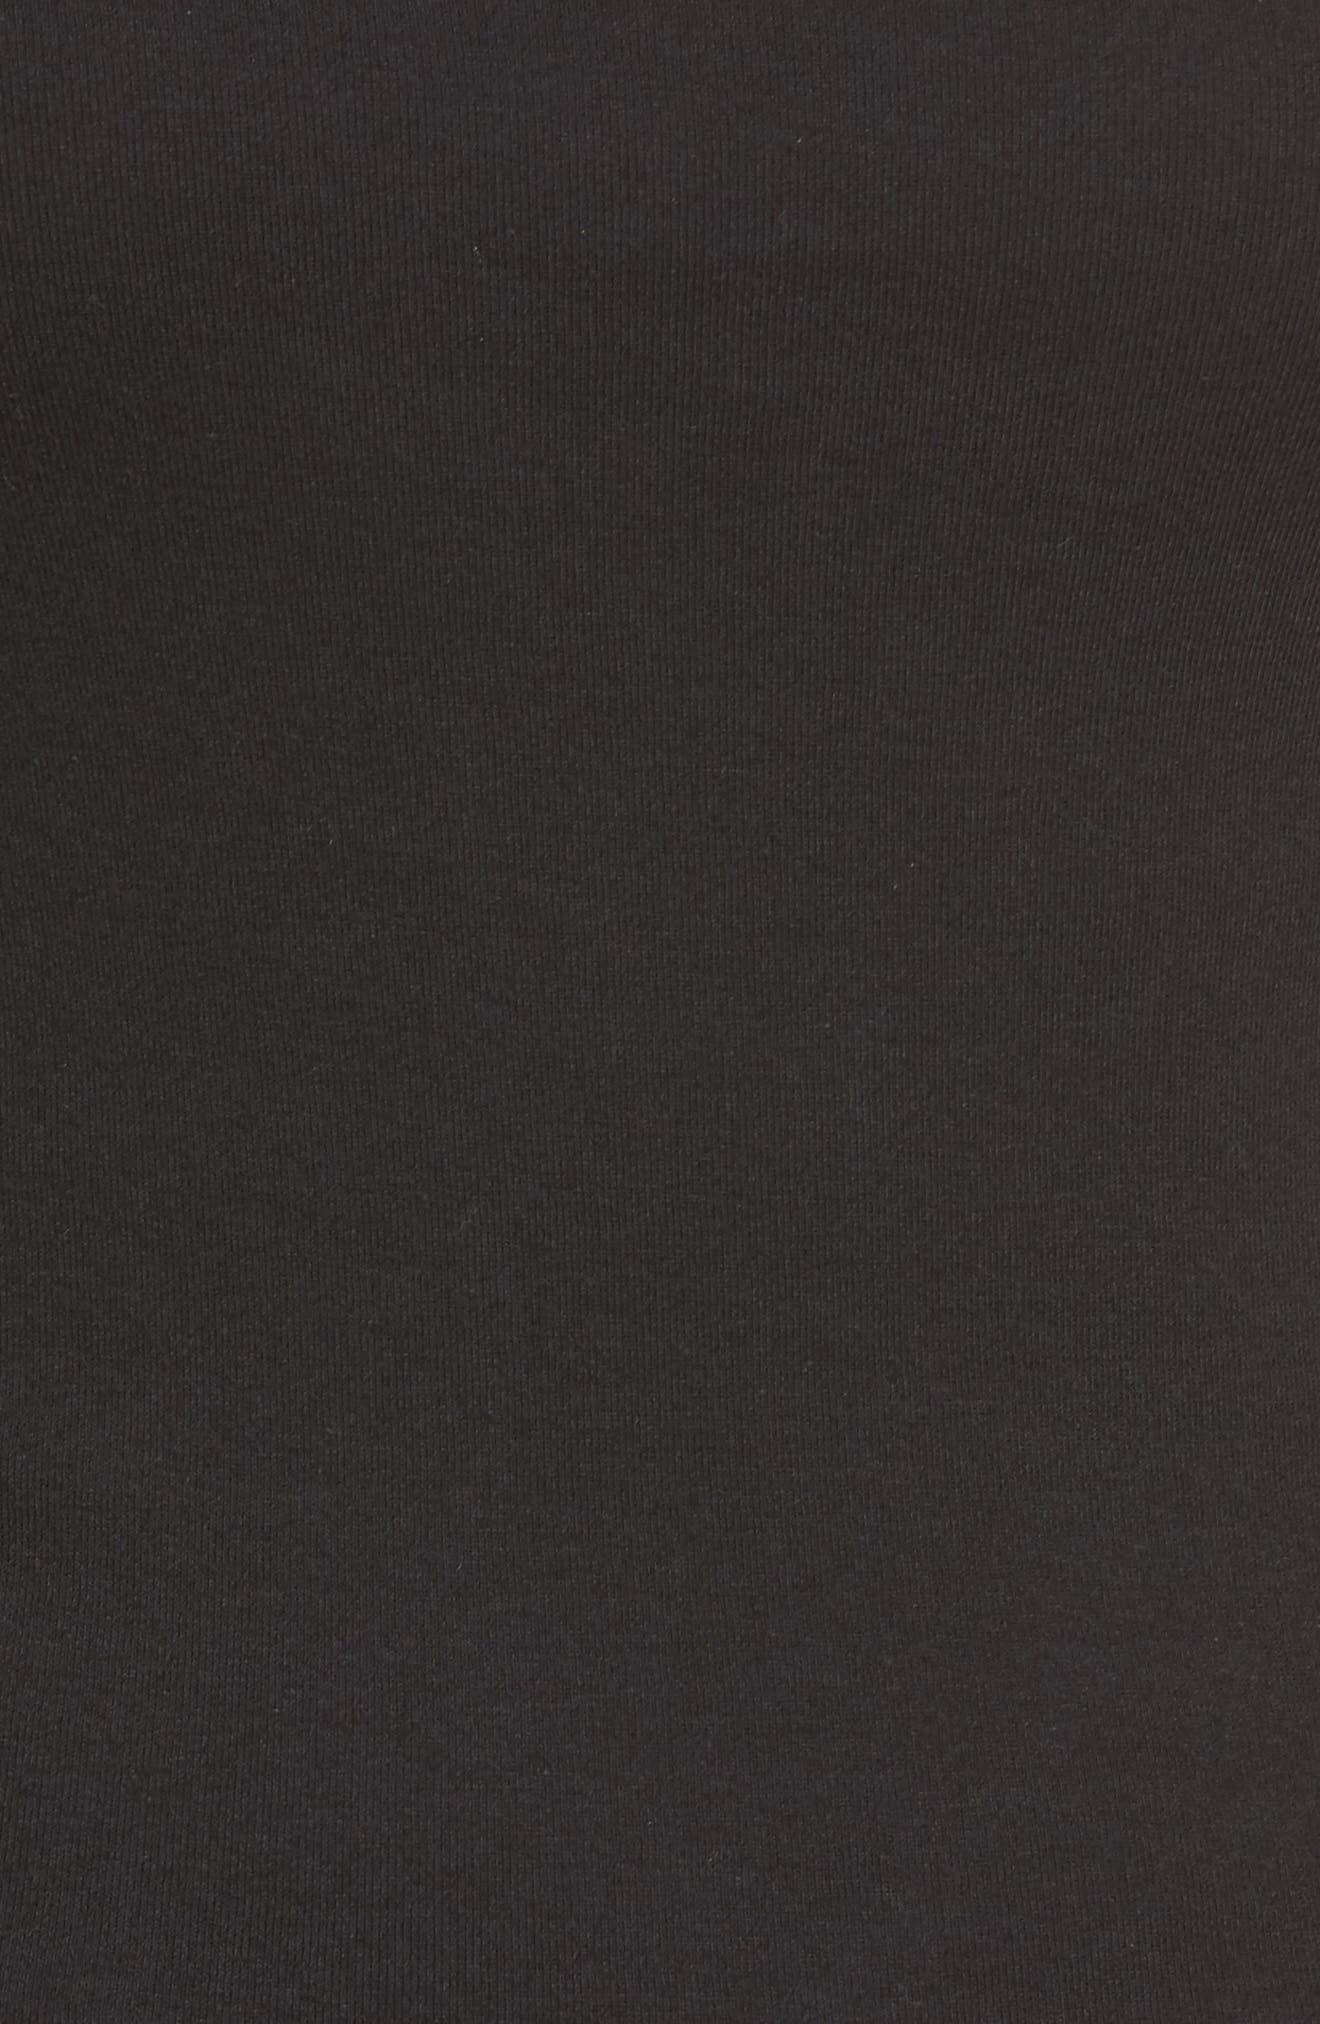 'Melody' Long Sleeve Scoop Neck Tee,                             Alternate thumbnail 5, color,                             Black